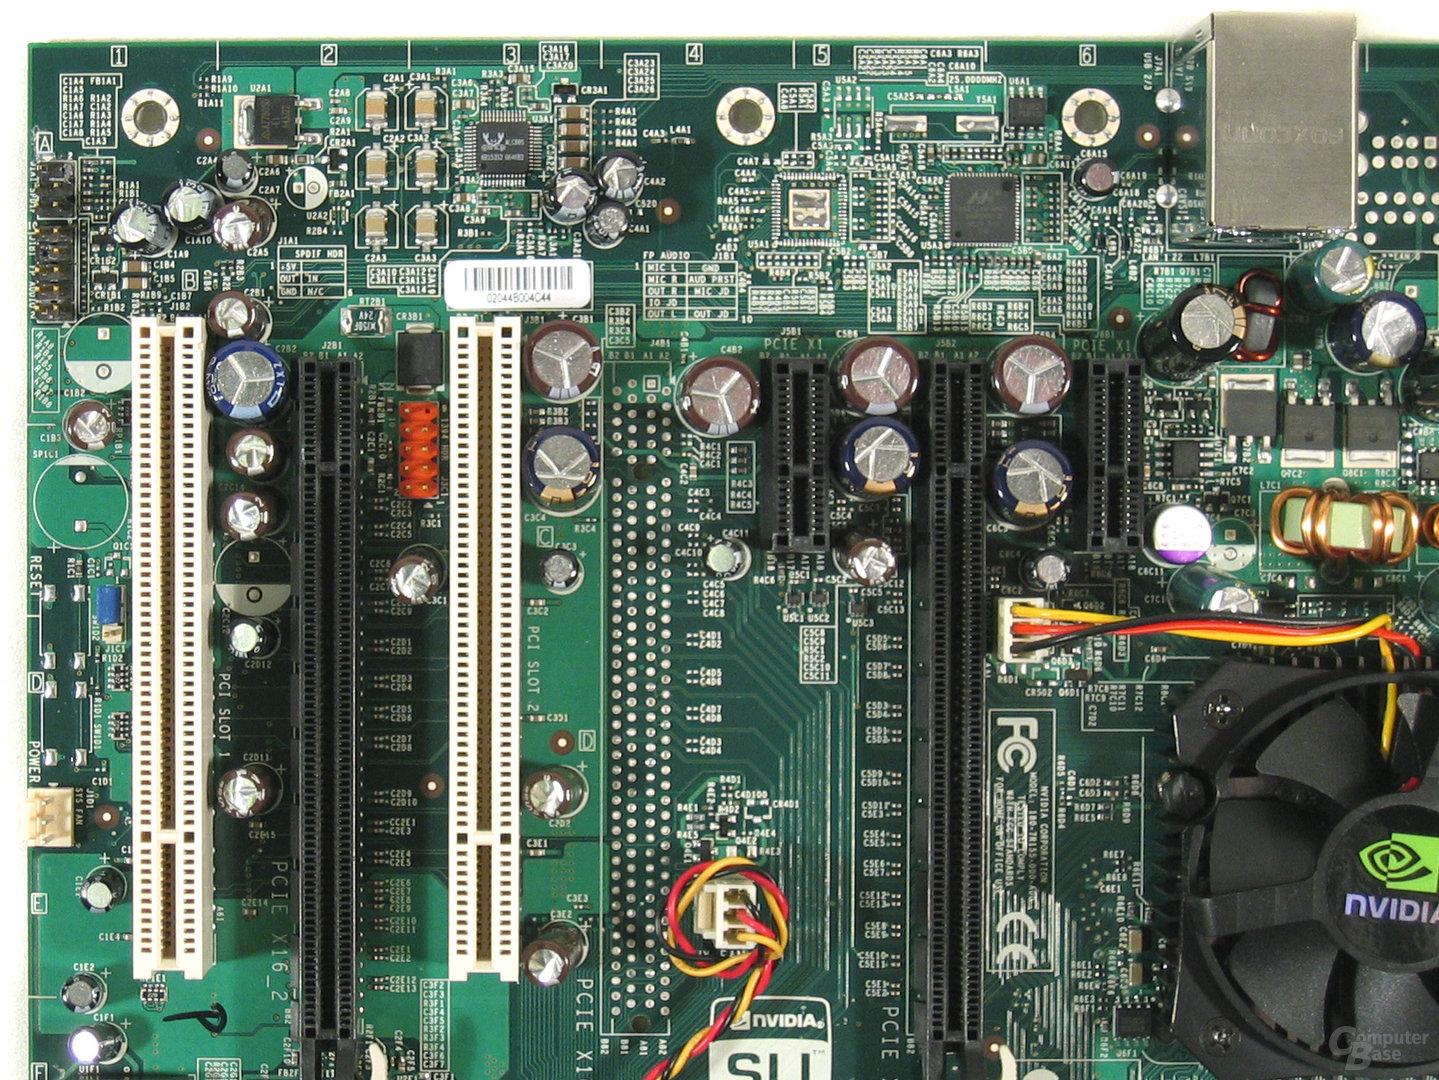 EVGA 122-CK-NF67